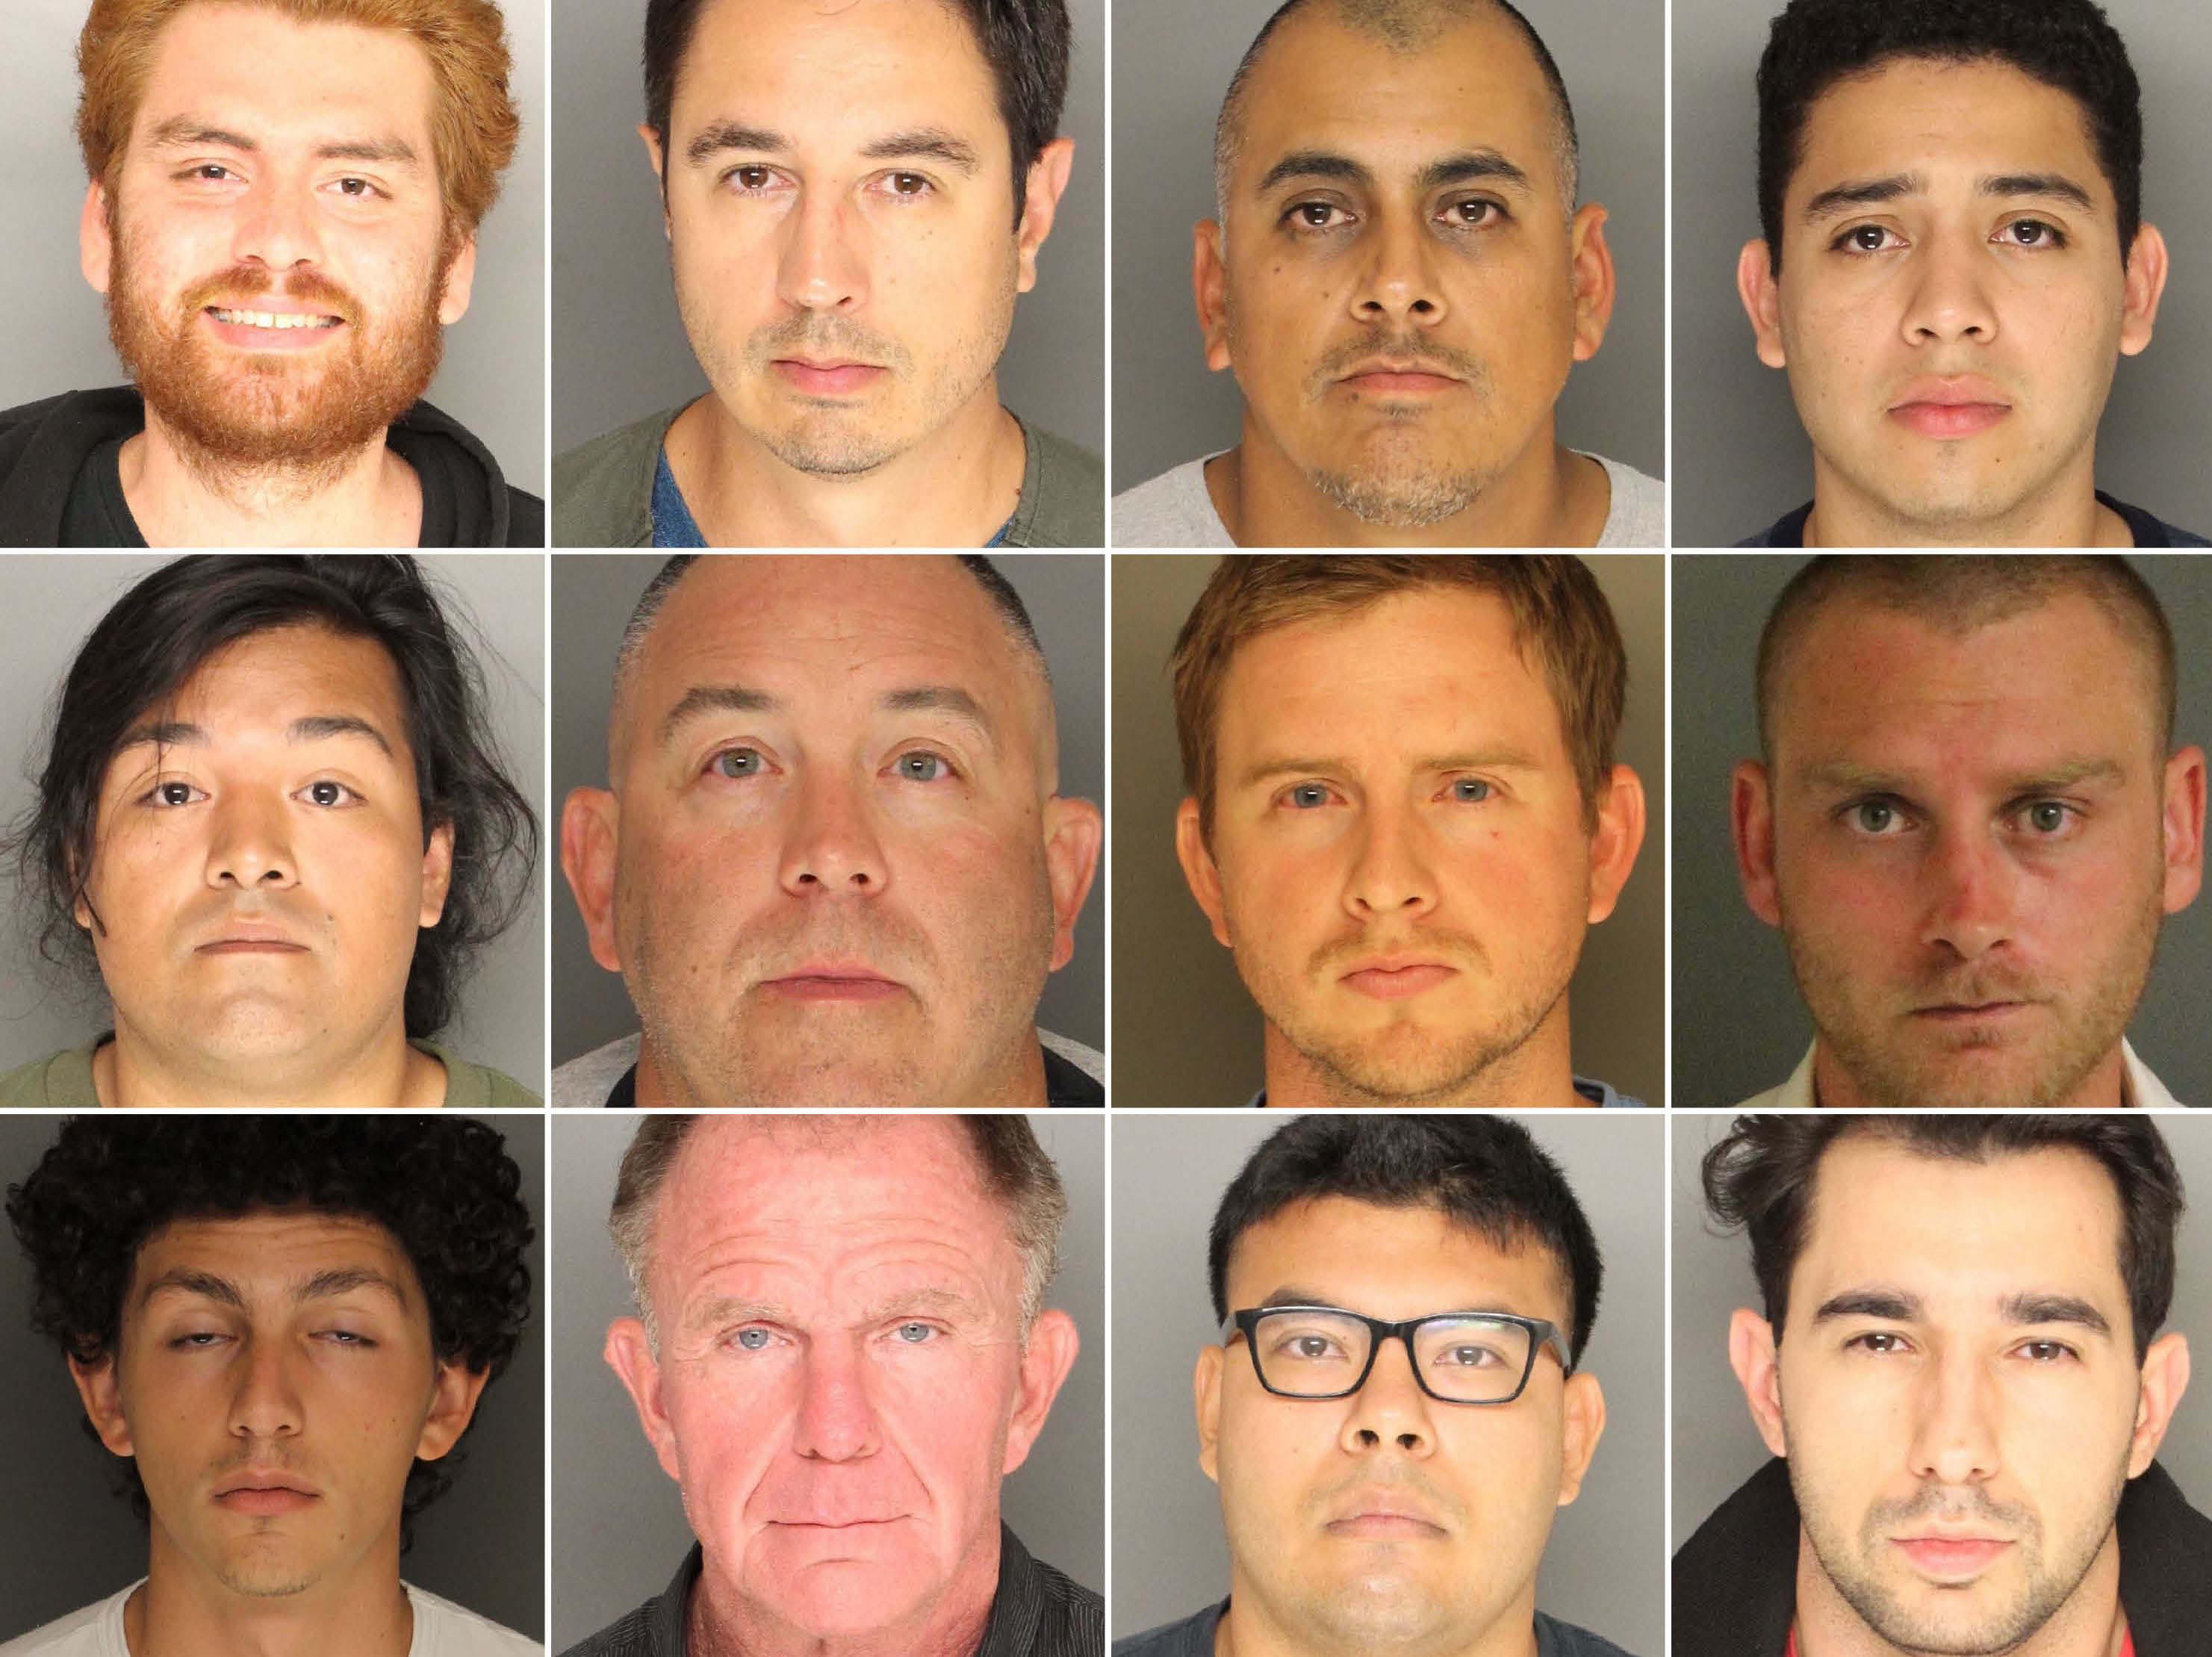 Prostitution Sting Arrests 17 in Goleta - The Santa Barbara